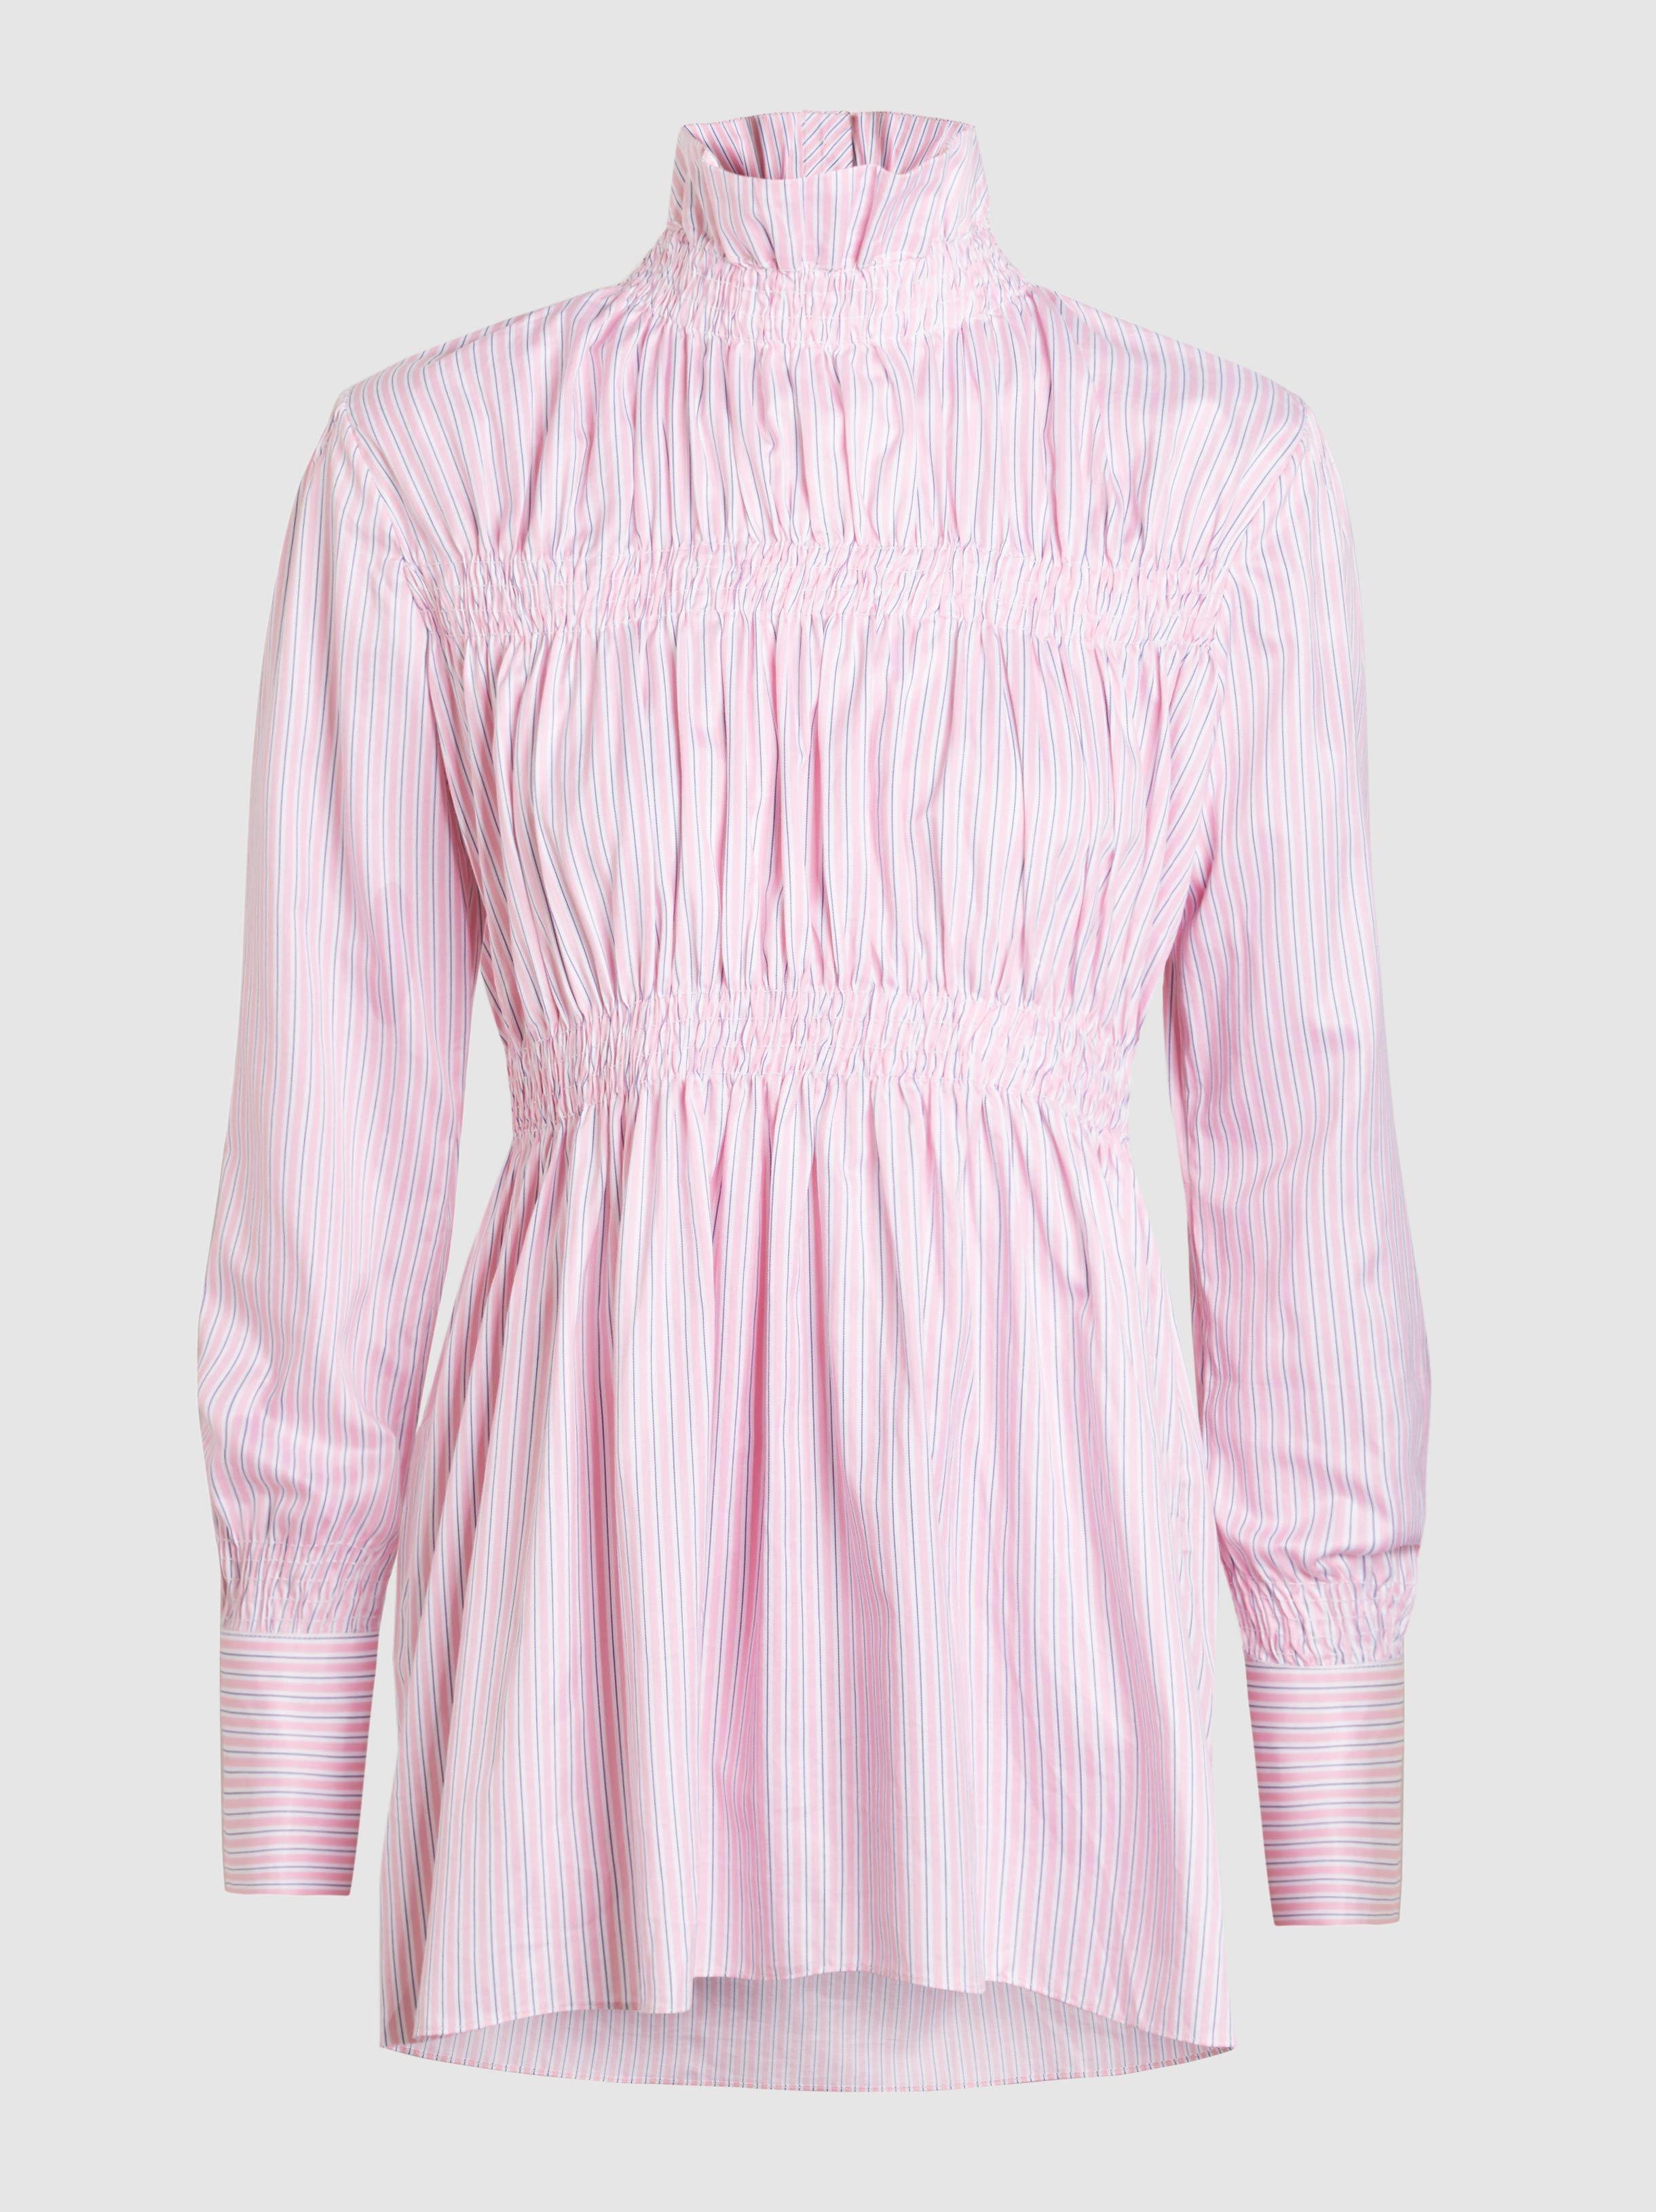 Striped Smocked Cotton Shirt Teija Online Cheapest VYsX5VB2Uk